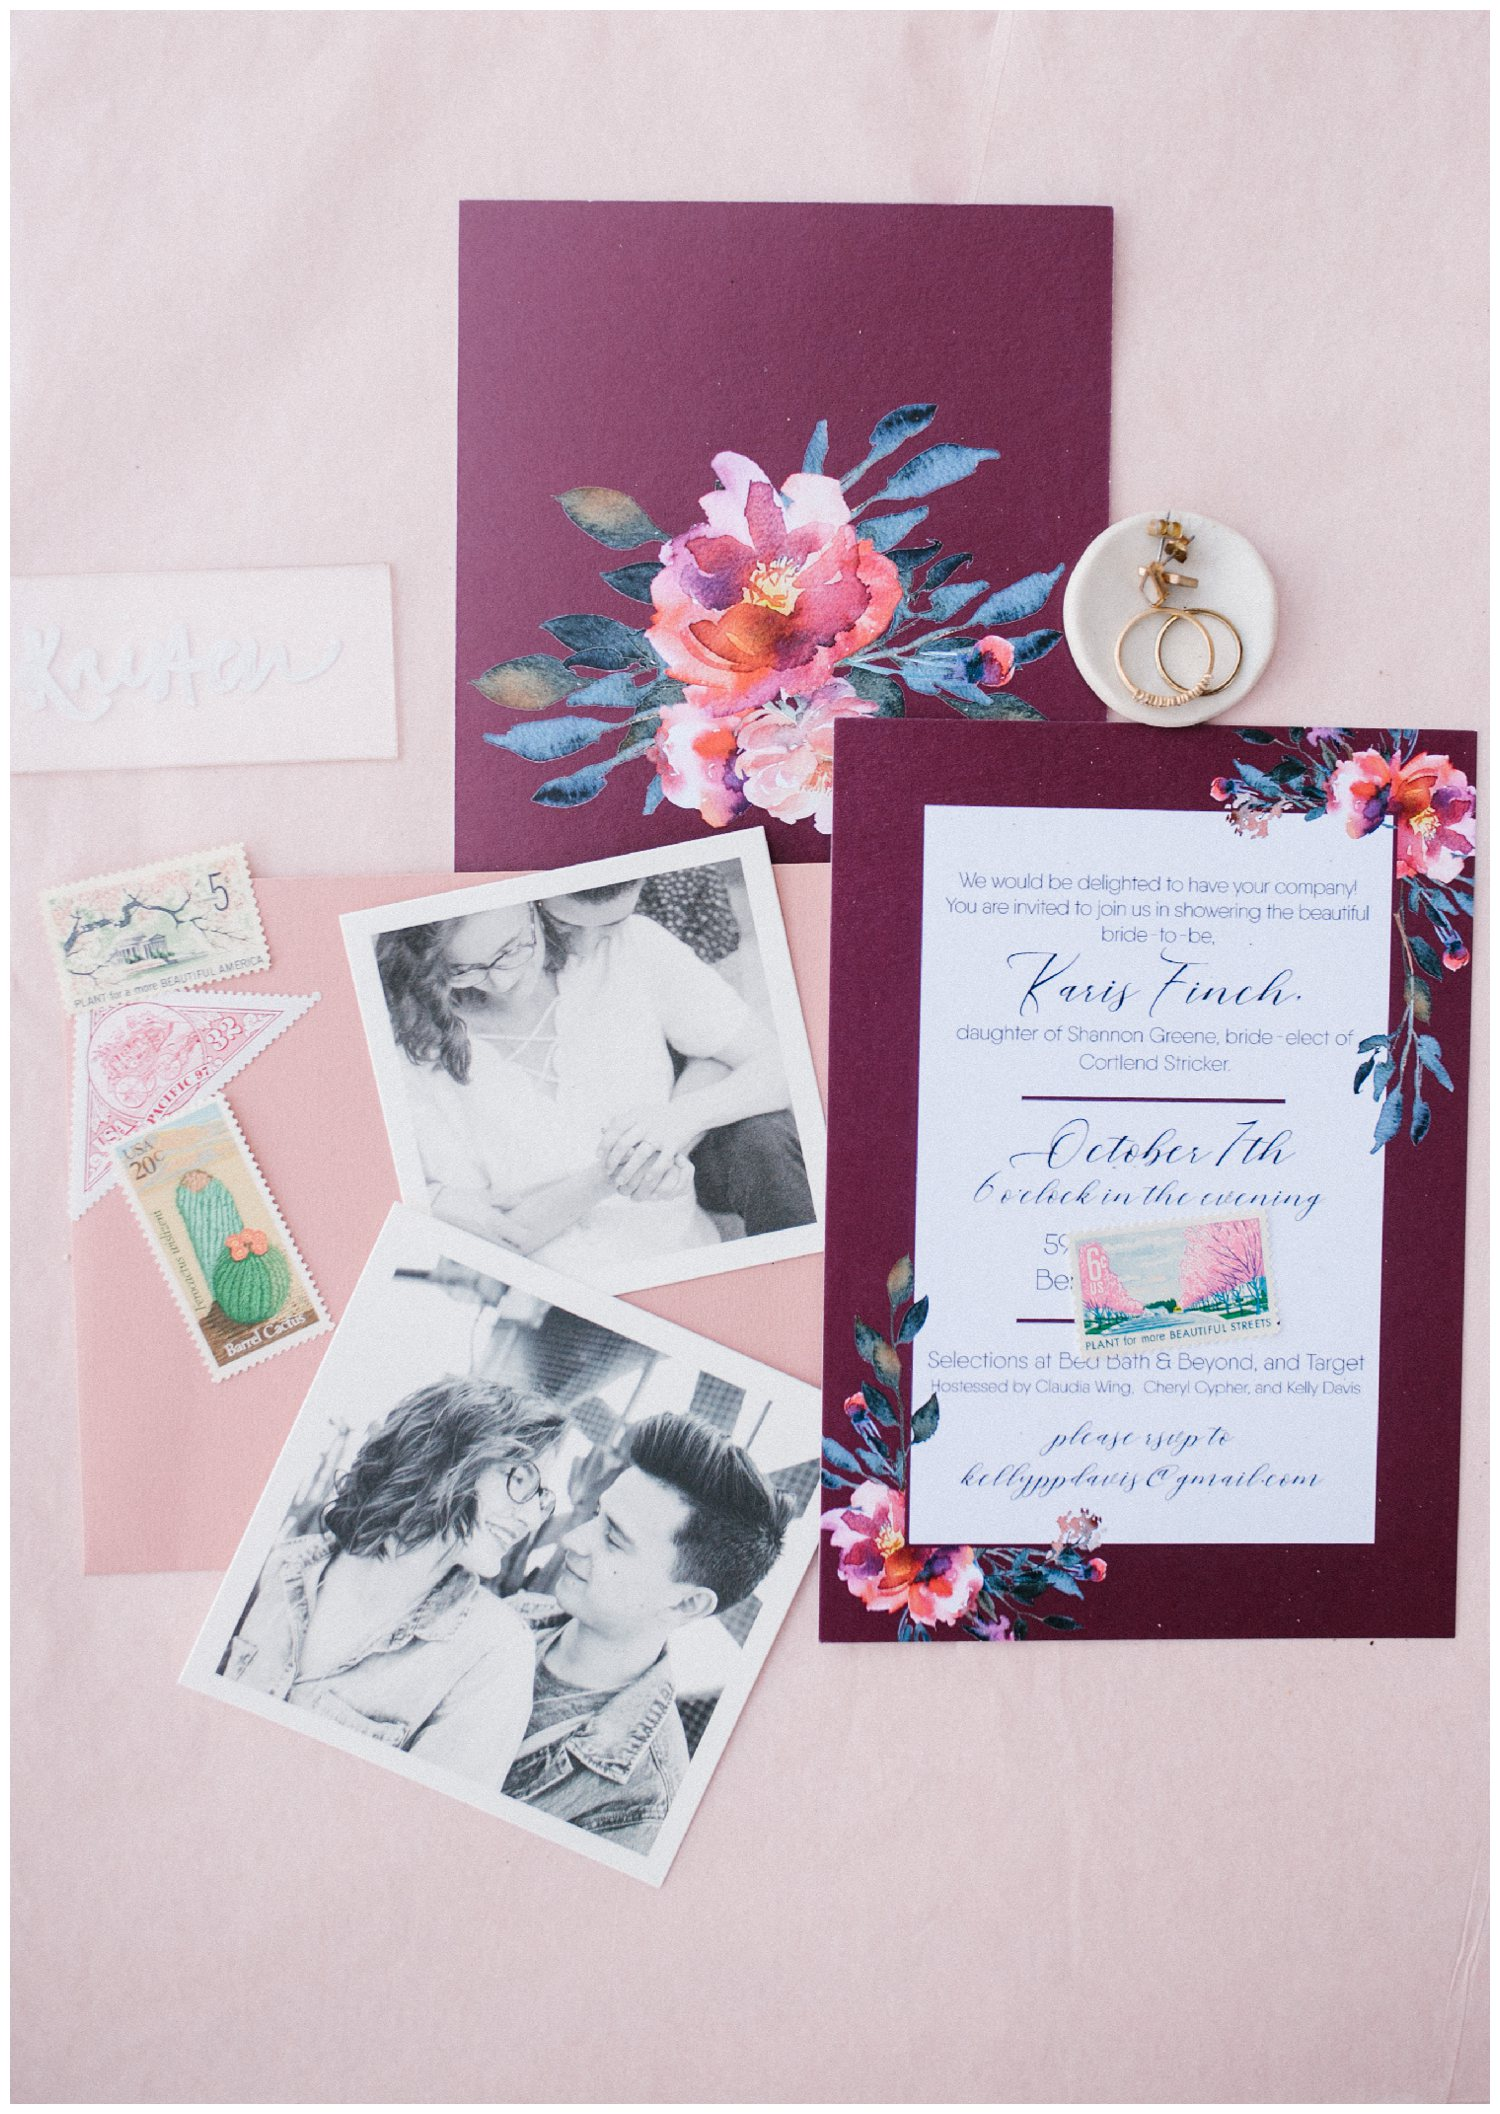 Floral bridal shower invitations_02.jpg